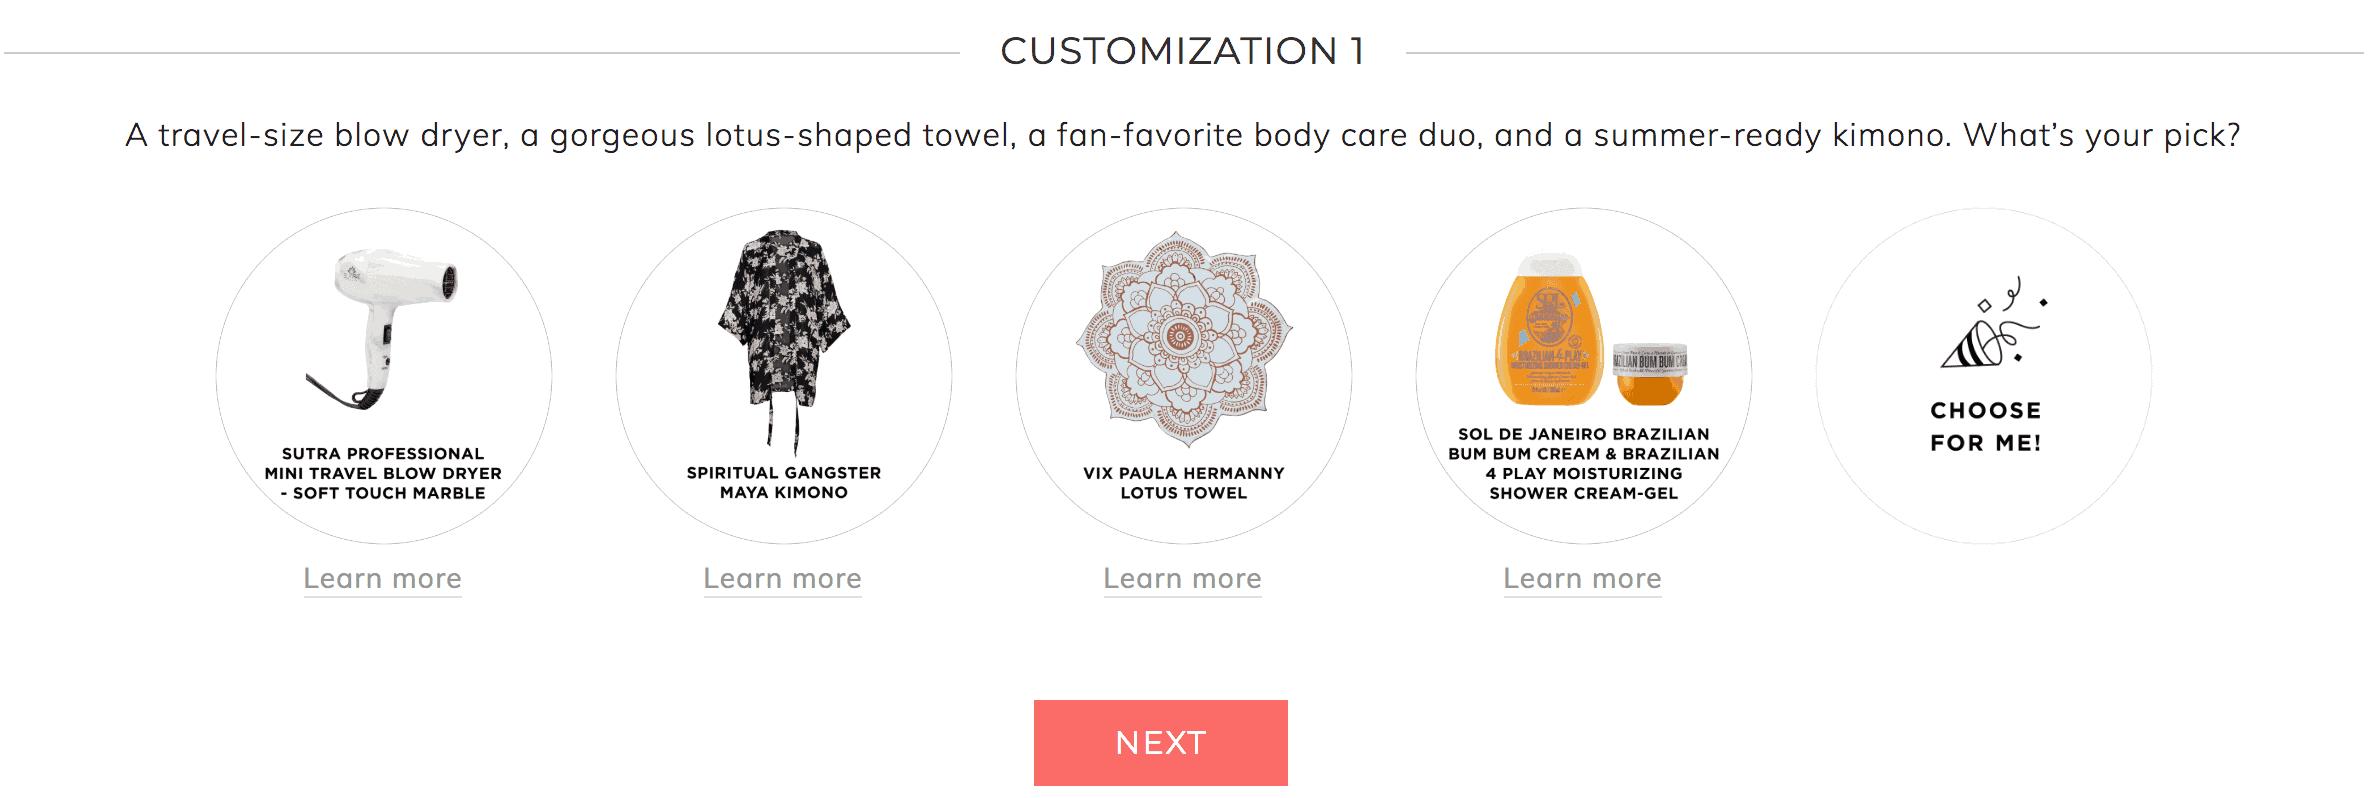 fabfitfun-beauty-box, fabfitfun-summer-box, fabfitfun, subscription-box, beauty-box